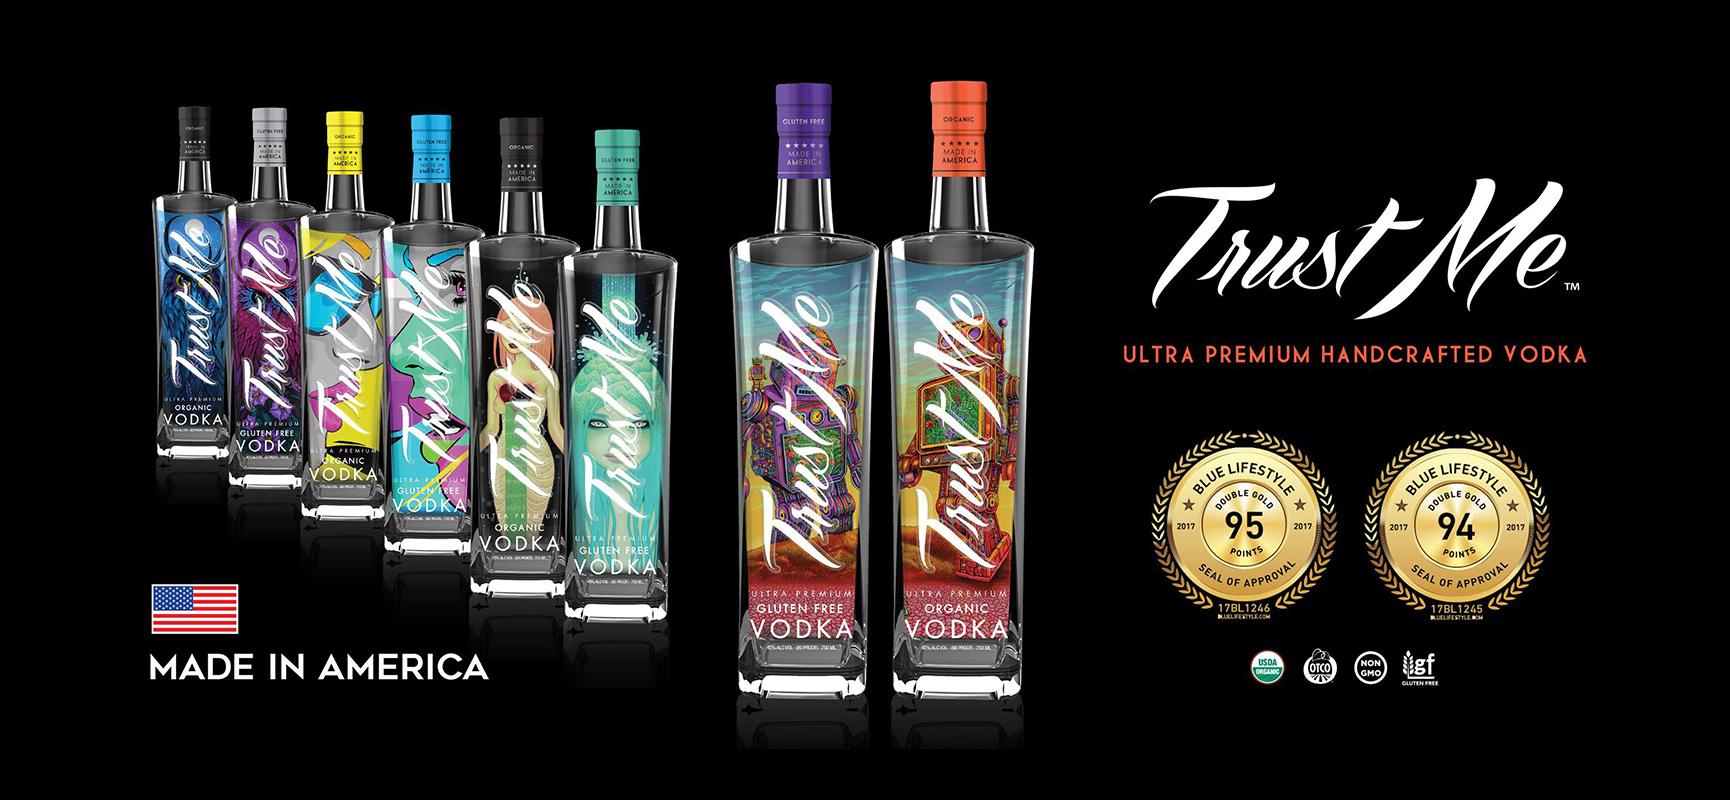 Tom Pernice Jr. Charity Pro-Am Golf Tournament - Trust Me Vodka